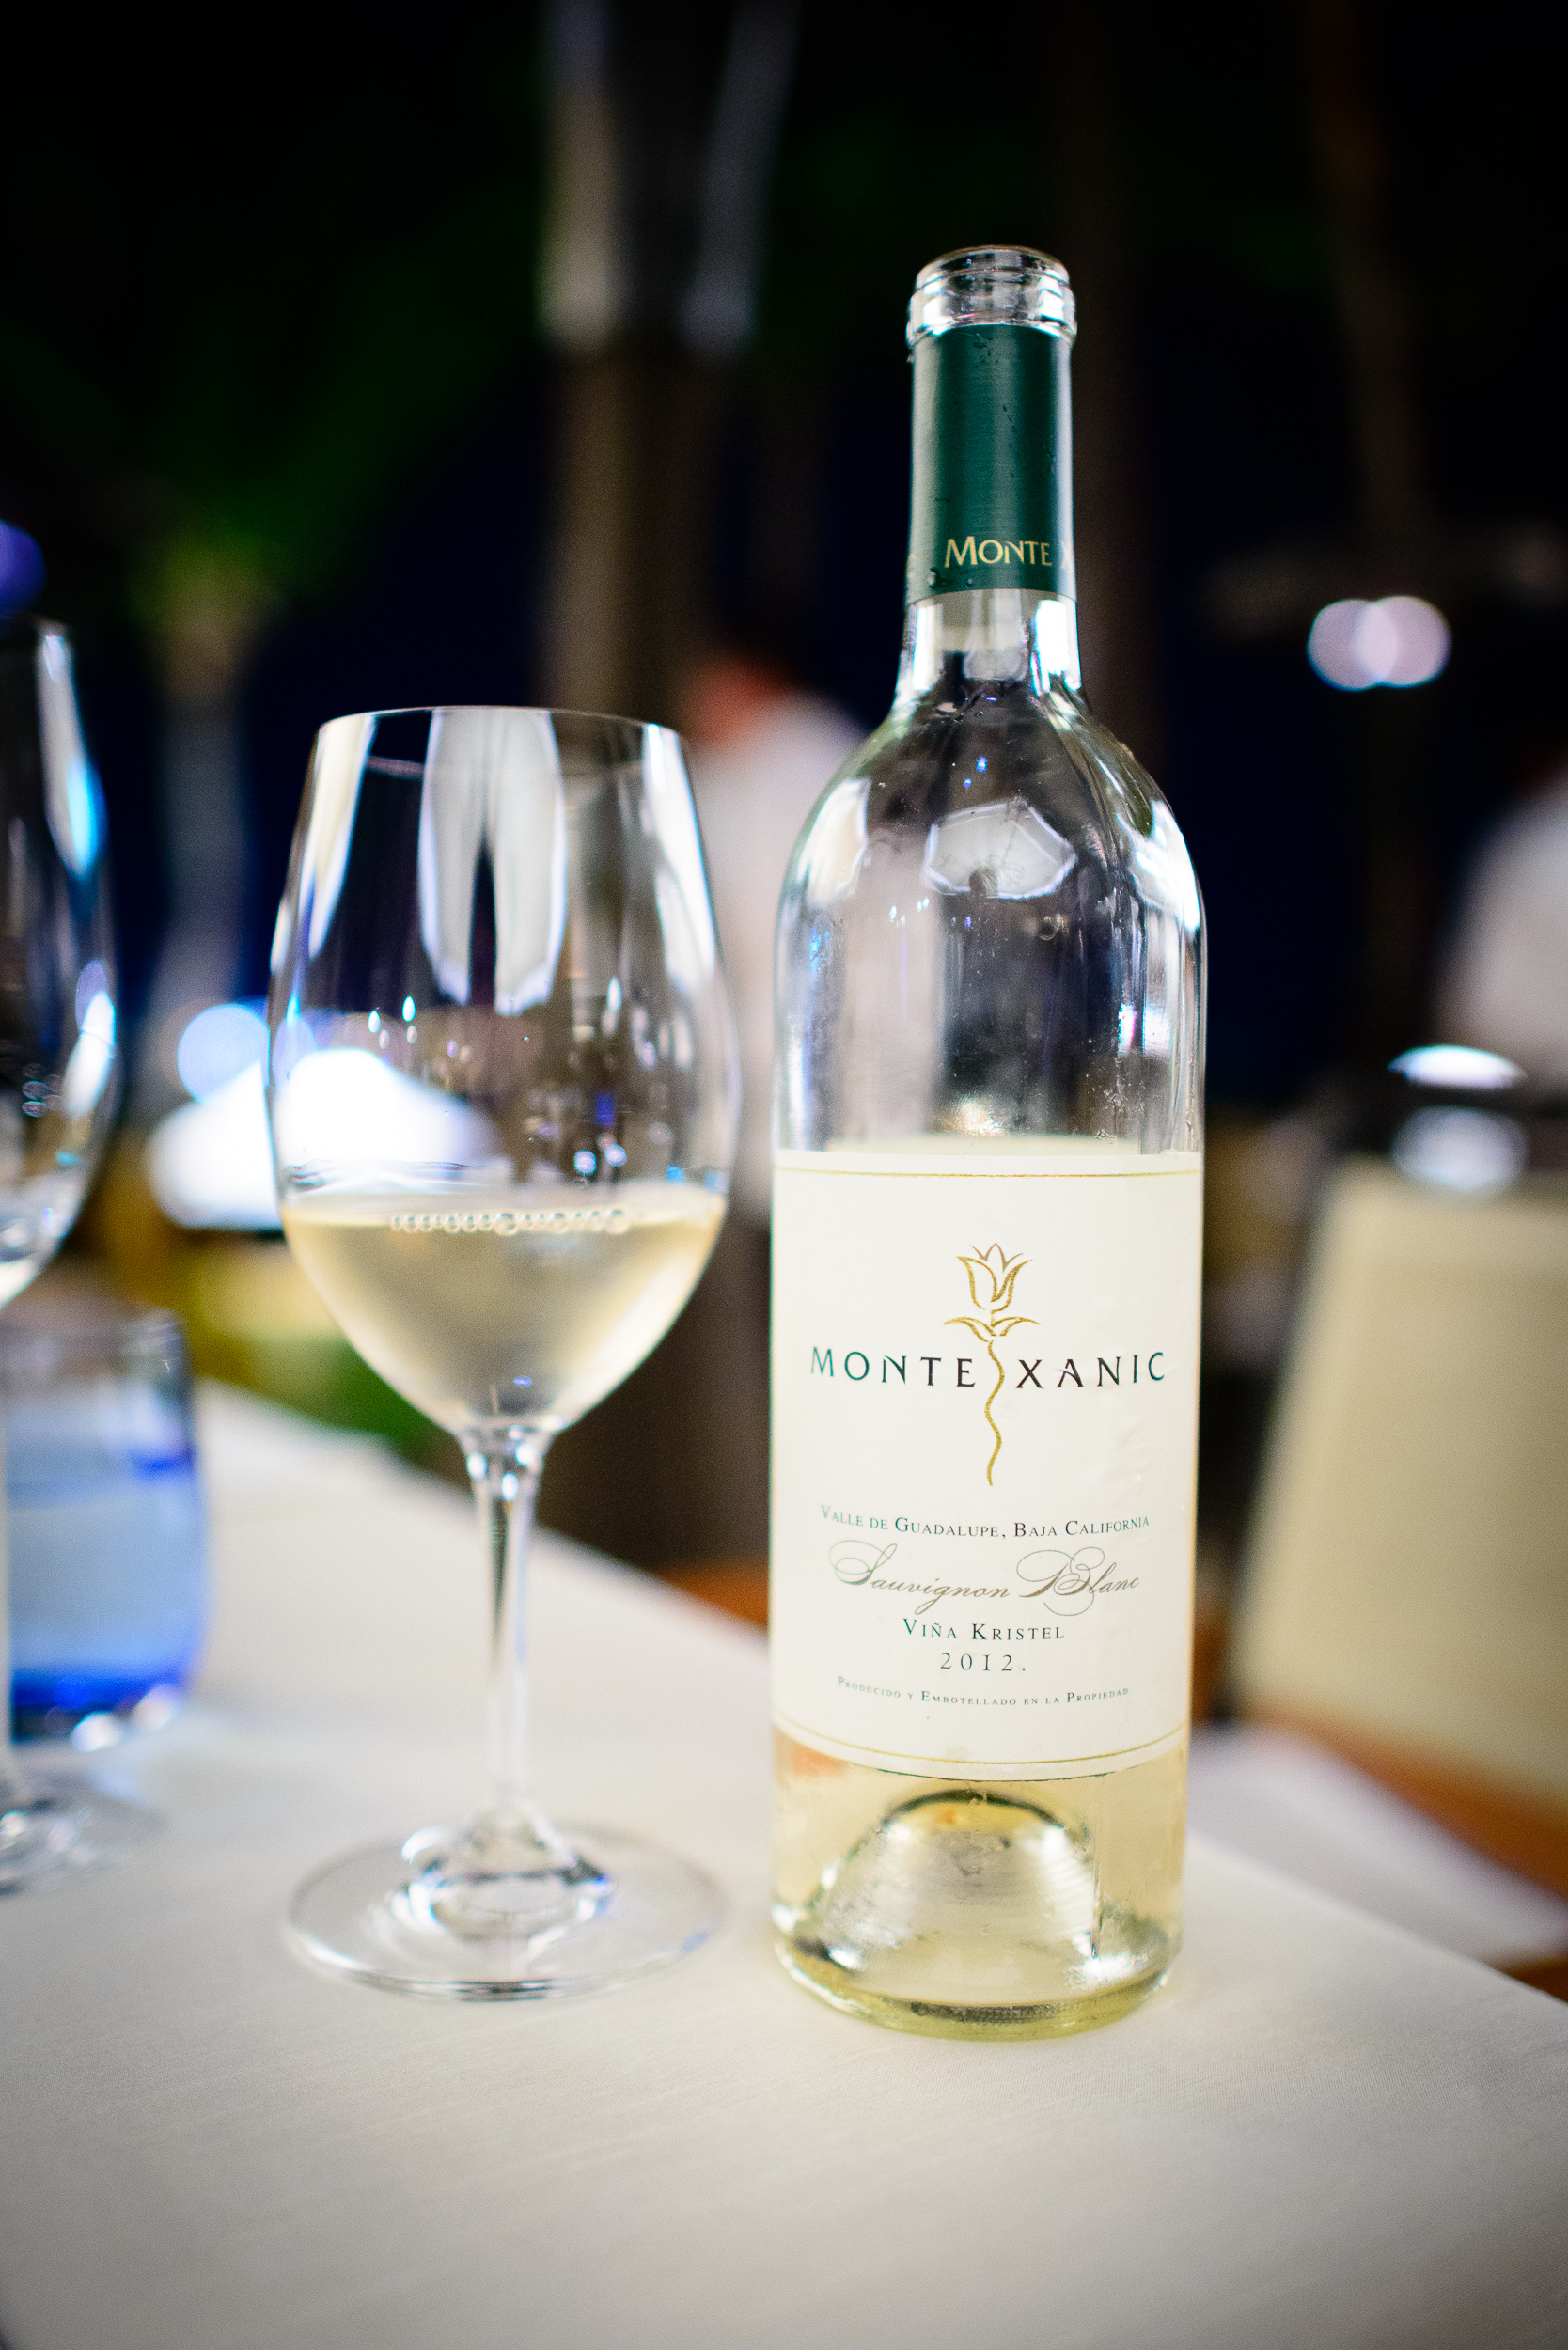 Monte Xanic Sauvignon Blanc 2012